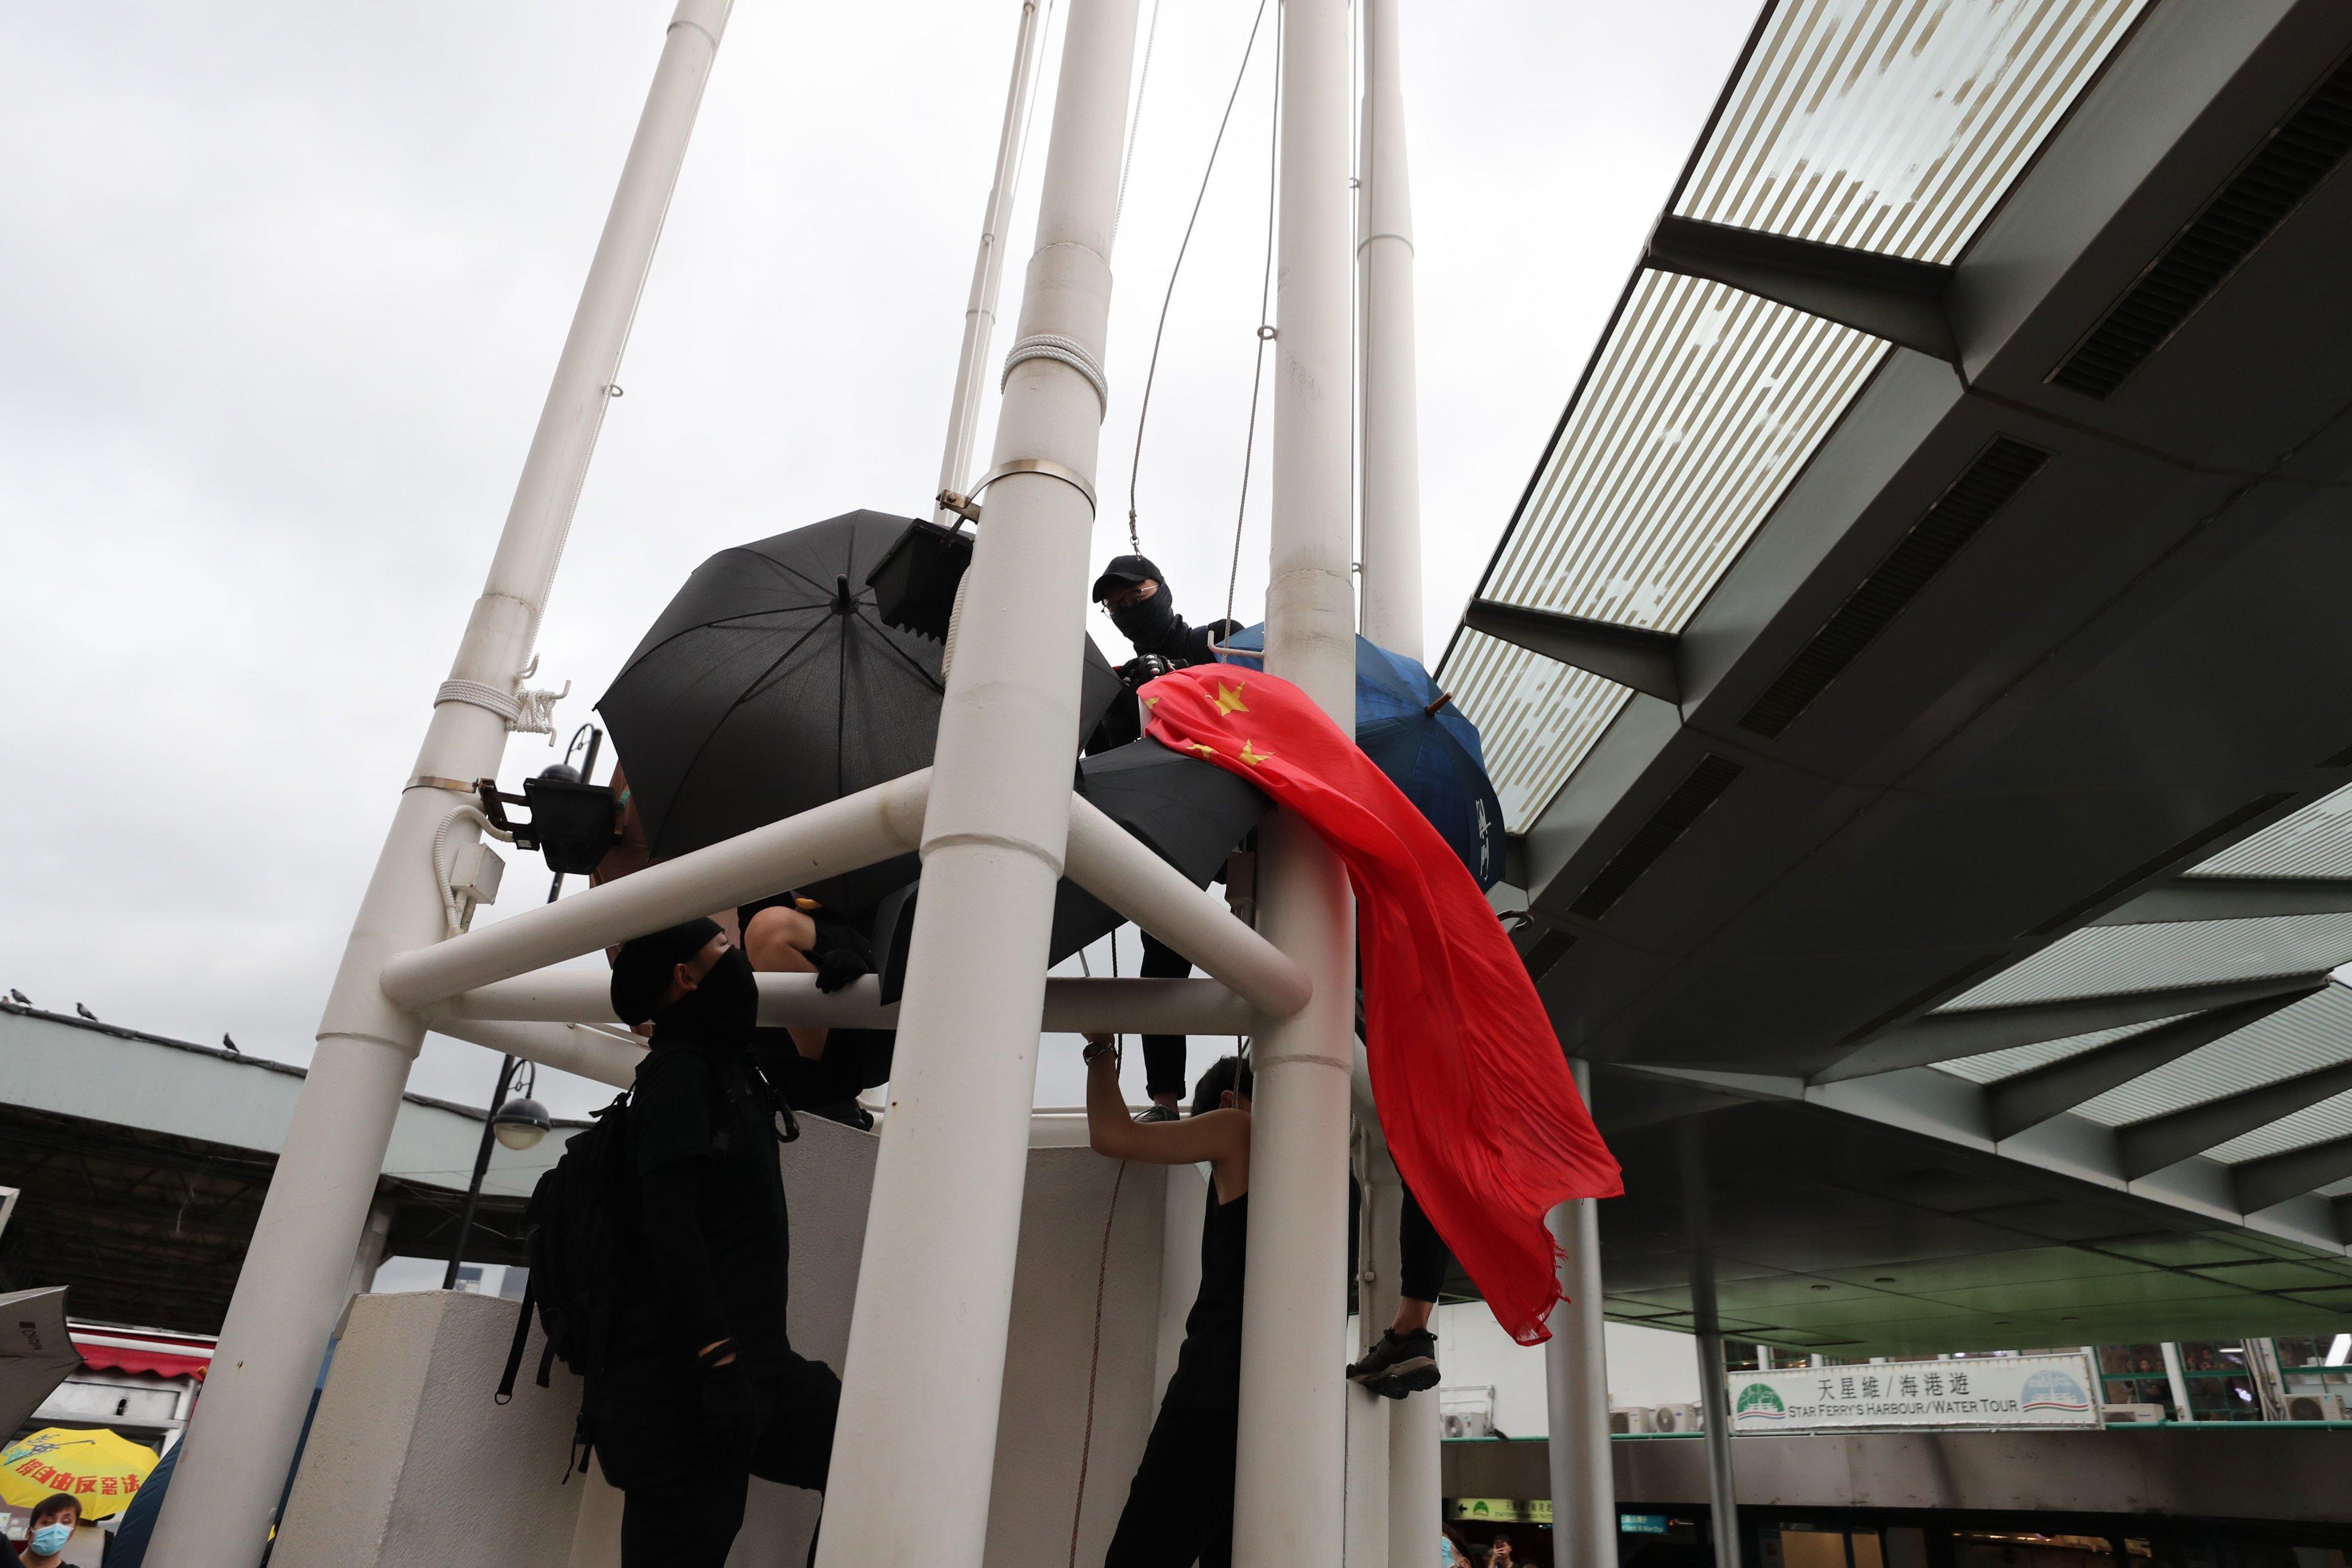 Hong Kong, manifestante strappa la bandiera della Cina